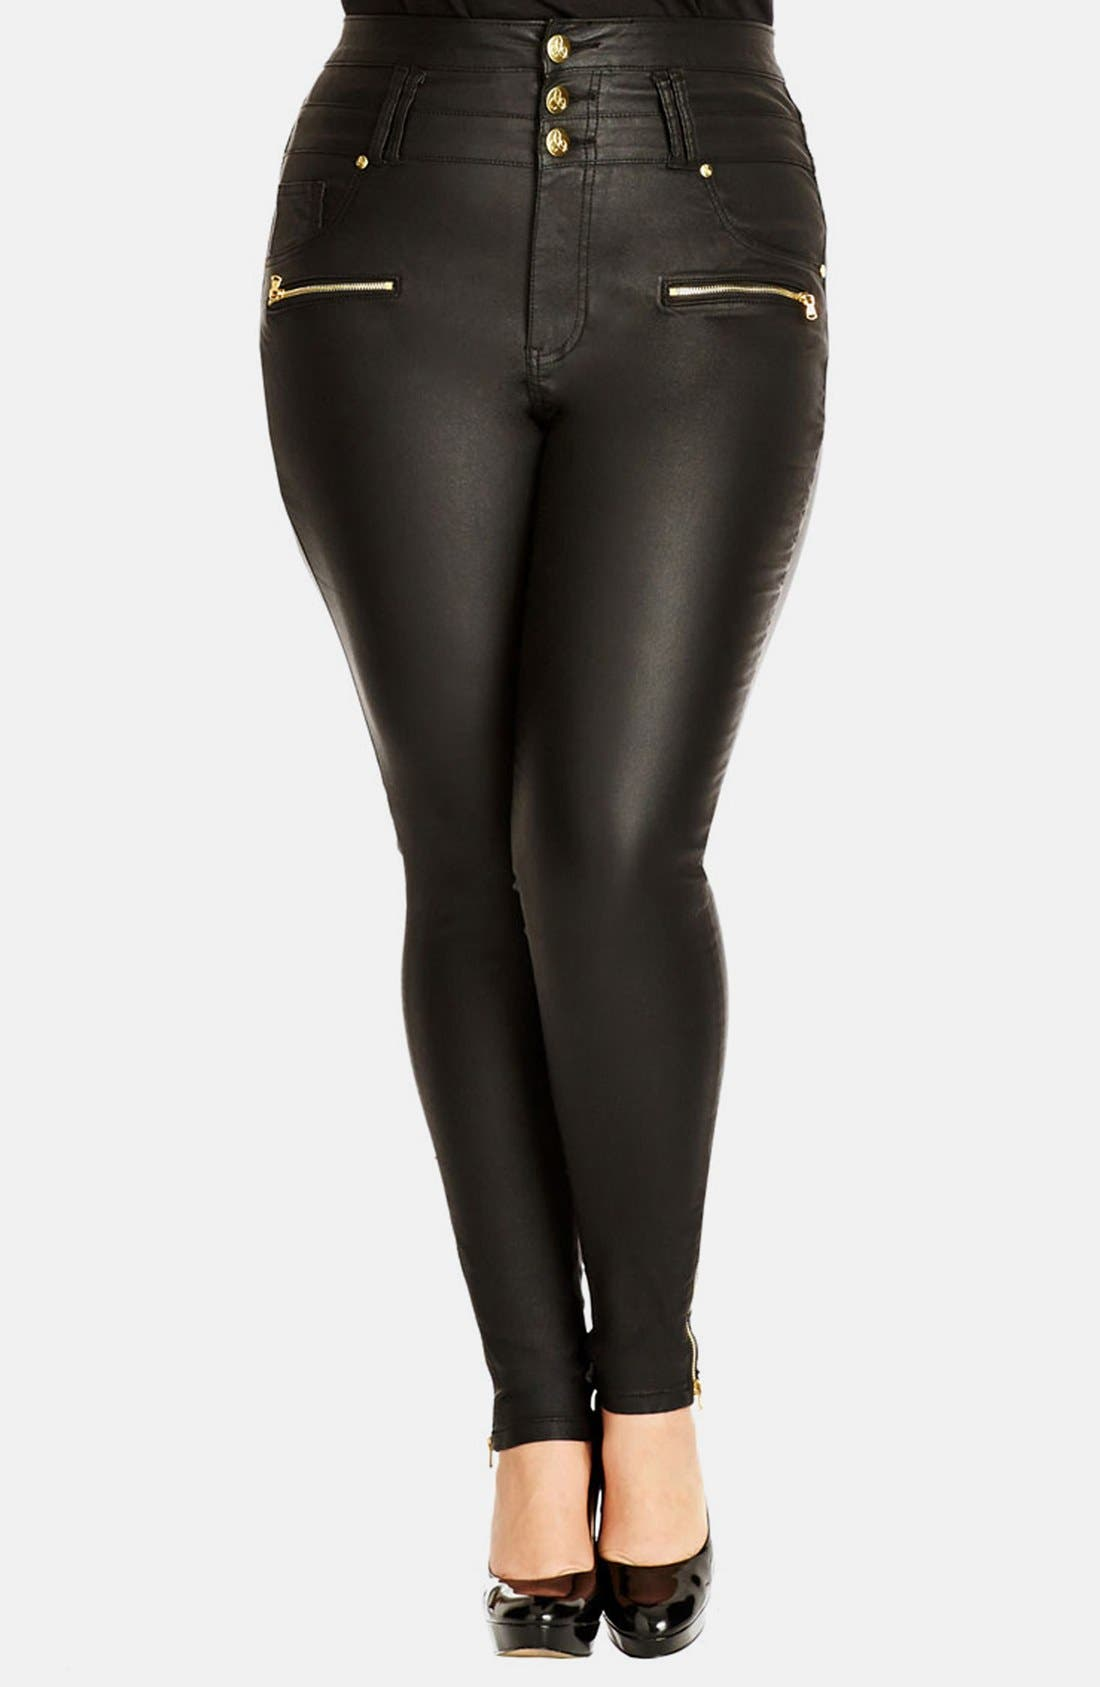 Main Image - City Chic 'Pick Me Up' Stretch Skinny Jeans (Black) (Plus Size)